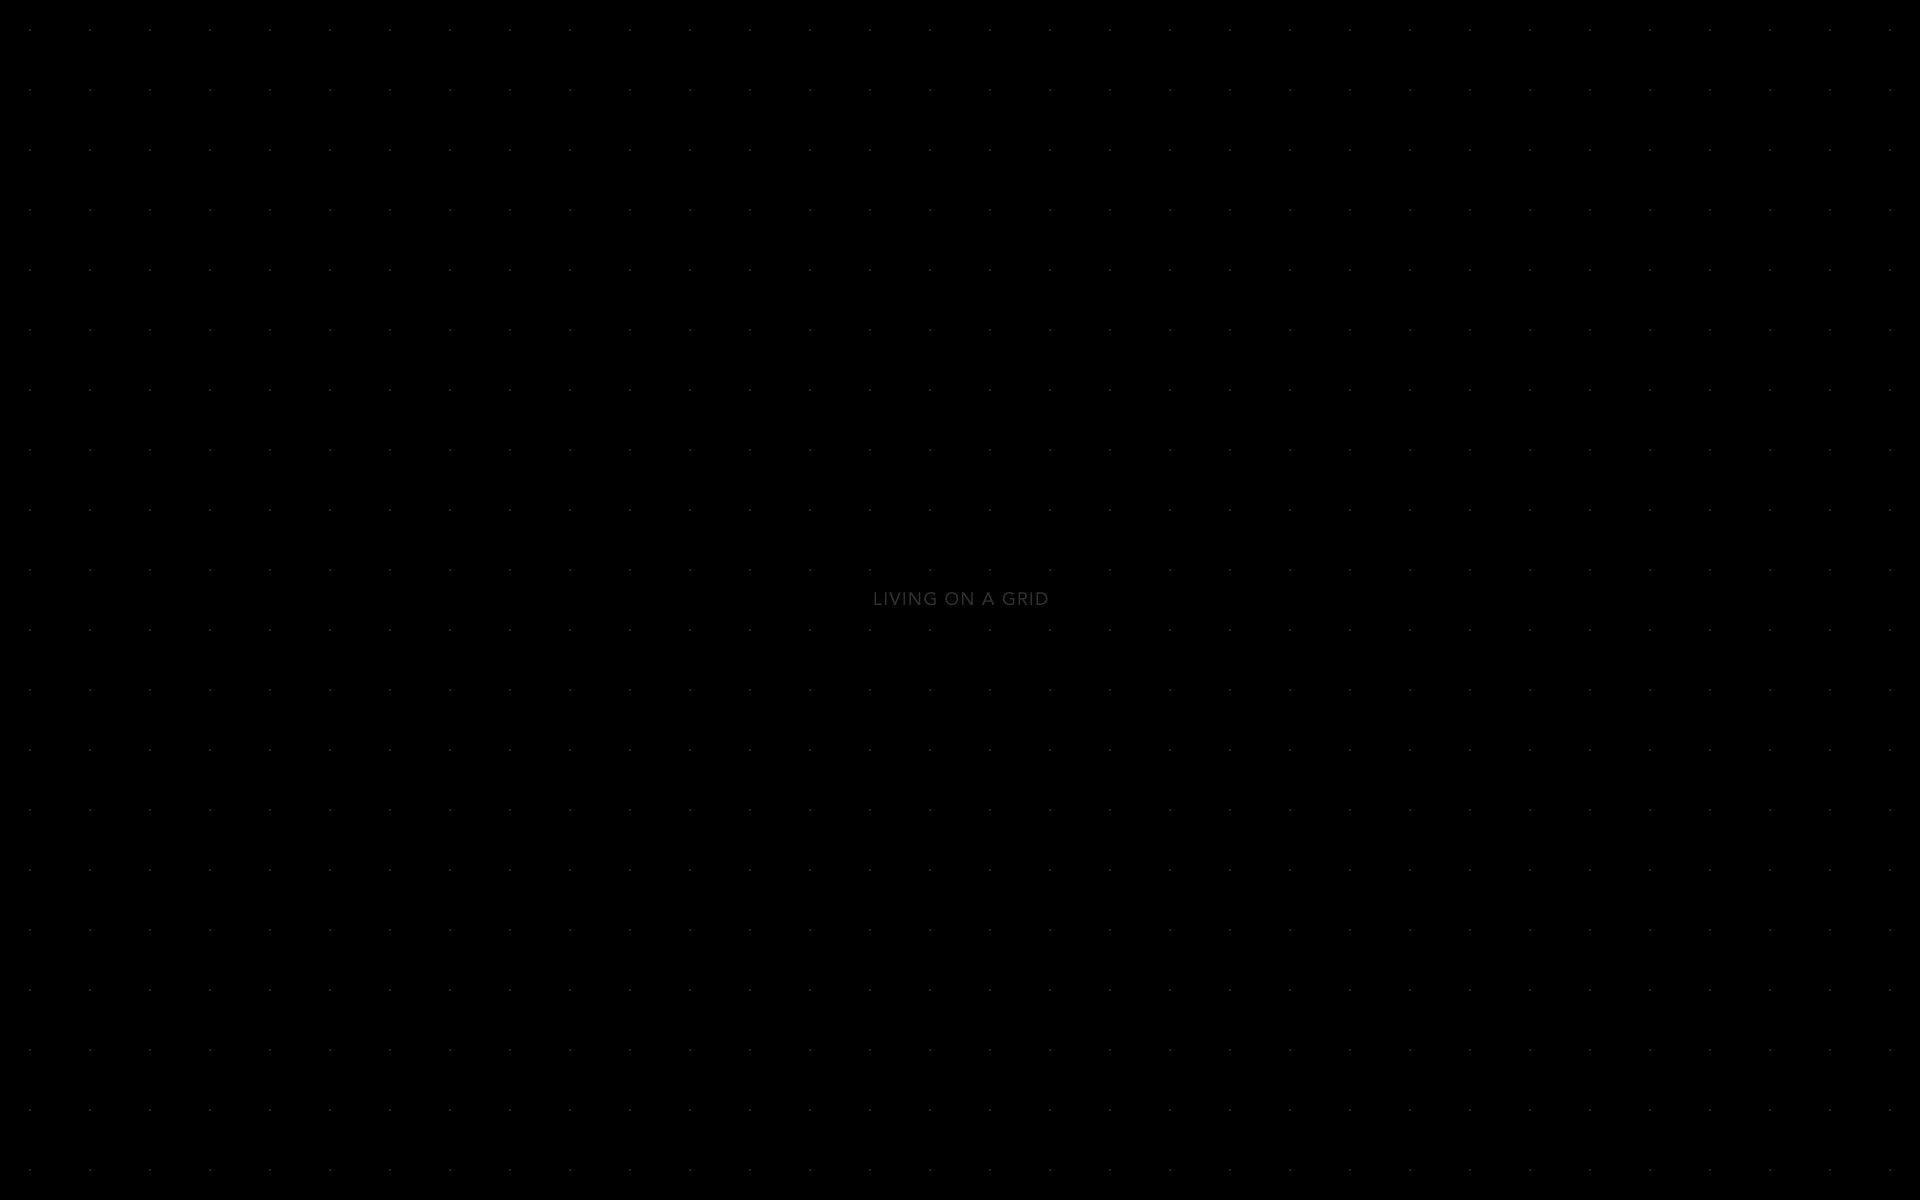 Grunge Aesthetic Black Desktop Wallpapers Top Free Grunge Aesthetic Black Desktop Backgrounds Wallpaperaccess